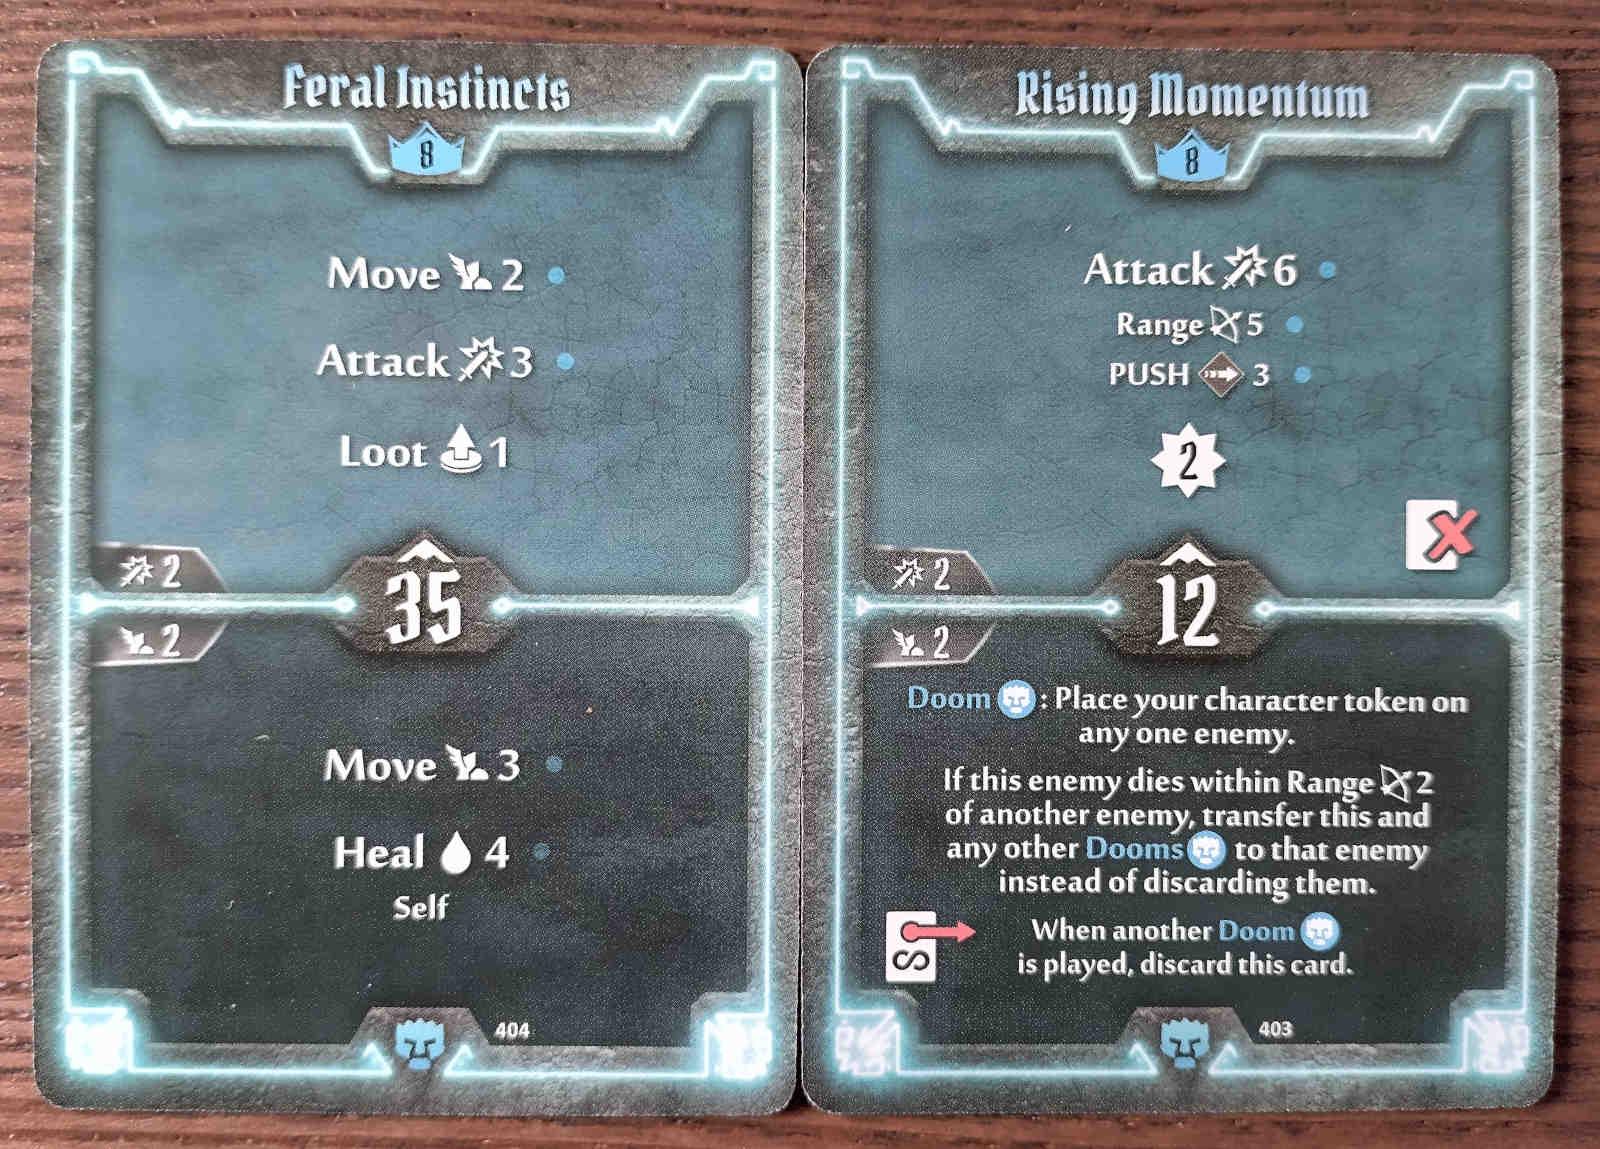 Level 8 Doomstalker cards - Feral Instincts and Rising Momentum